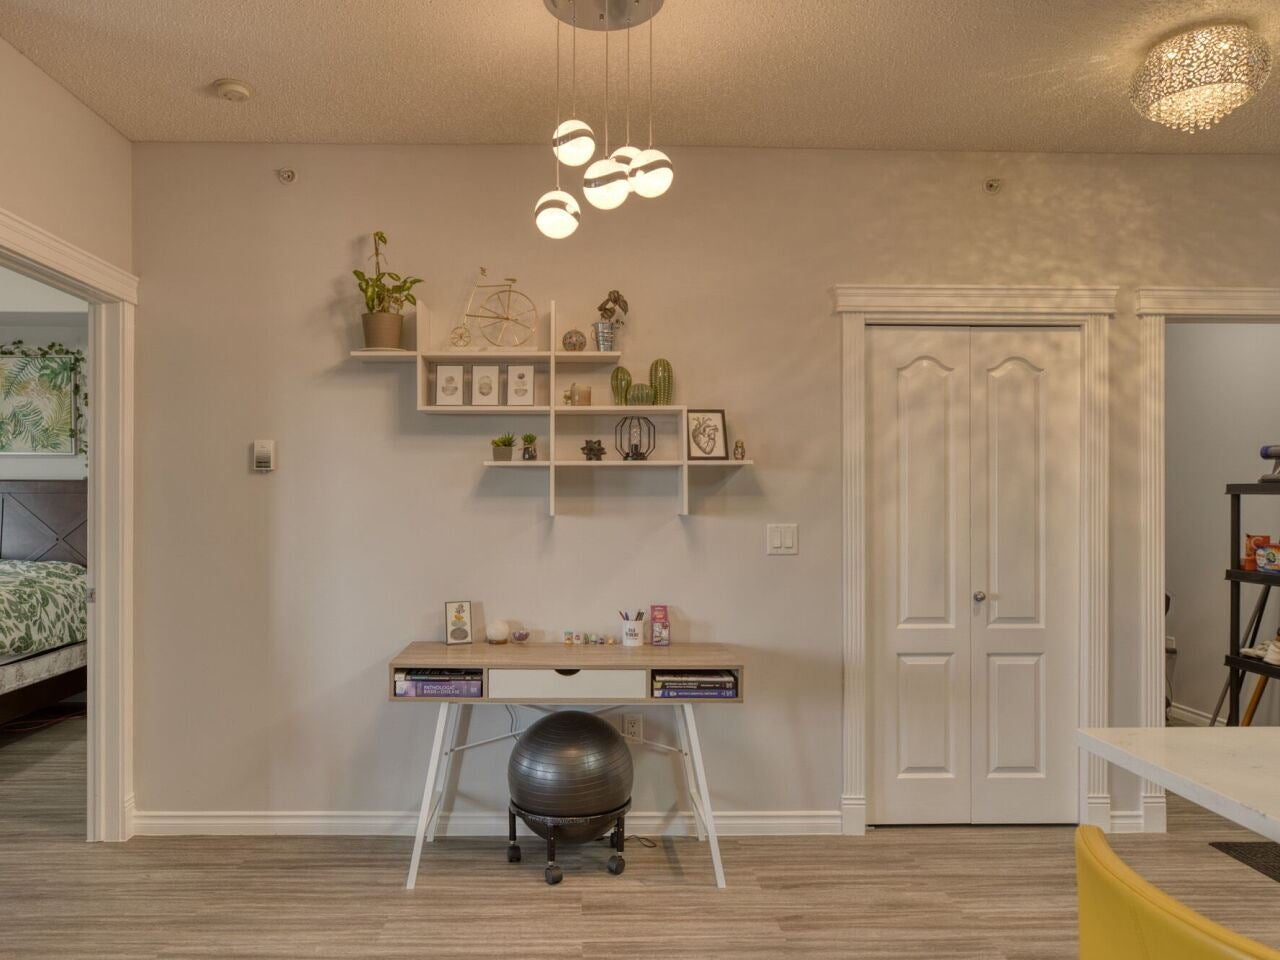 429 16807 100 Avenue - Glenwood_EDMO Lowrise Apartment for sale, 2 Bedrooms (E4234341) #12